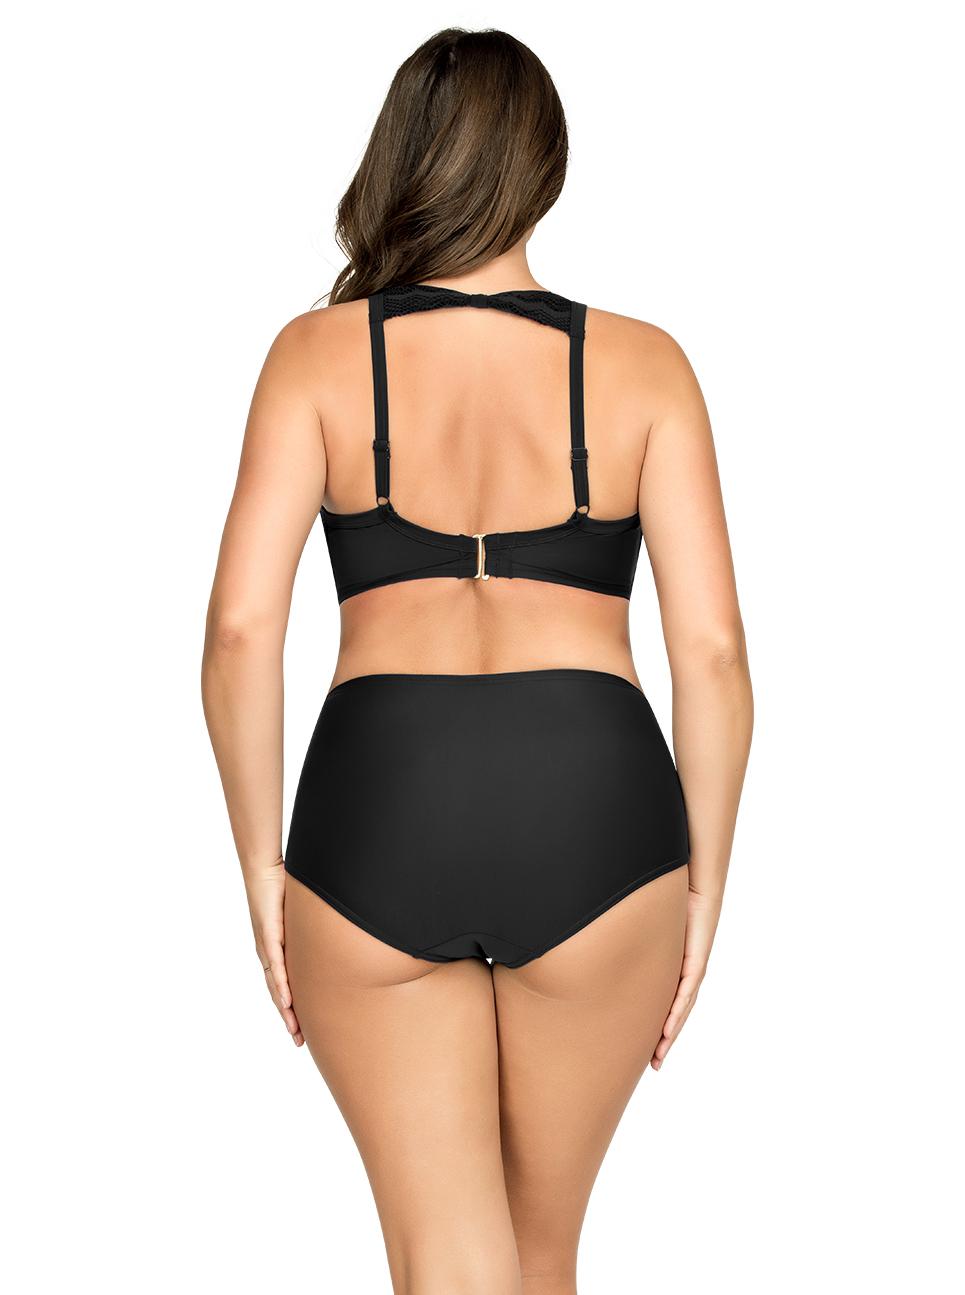 PARFAIT Keira HalterNeckBikiniTopS8071 HighWaistBikiniBottomS8075 Black Back - Keira High-Waist Bikini Bottom Black S8075